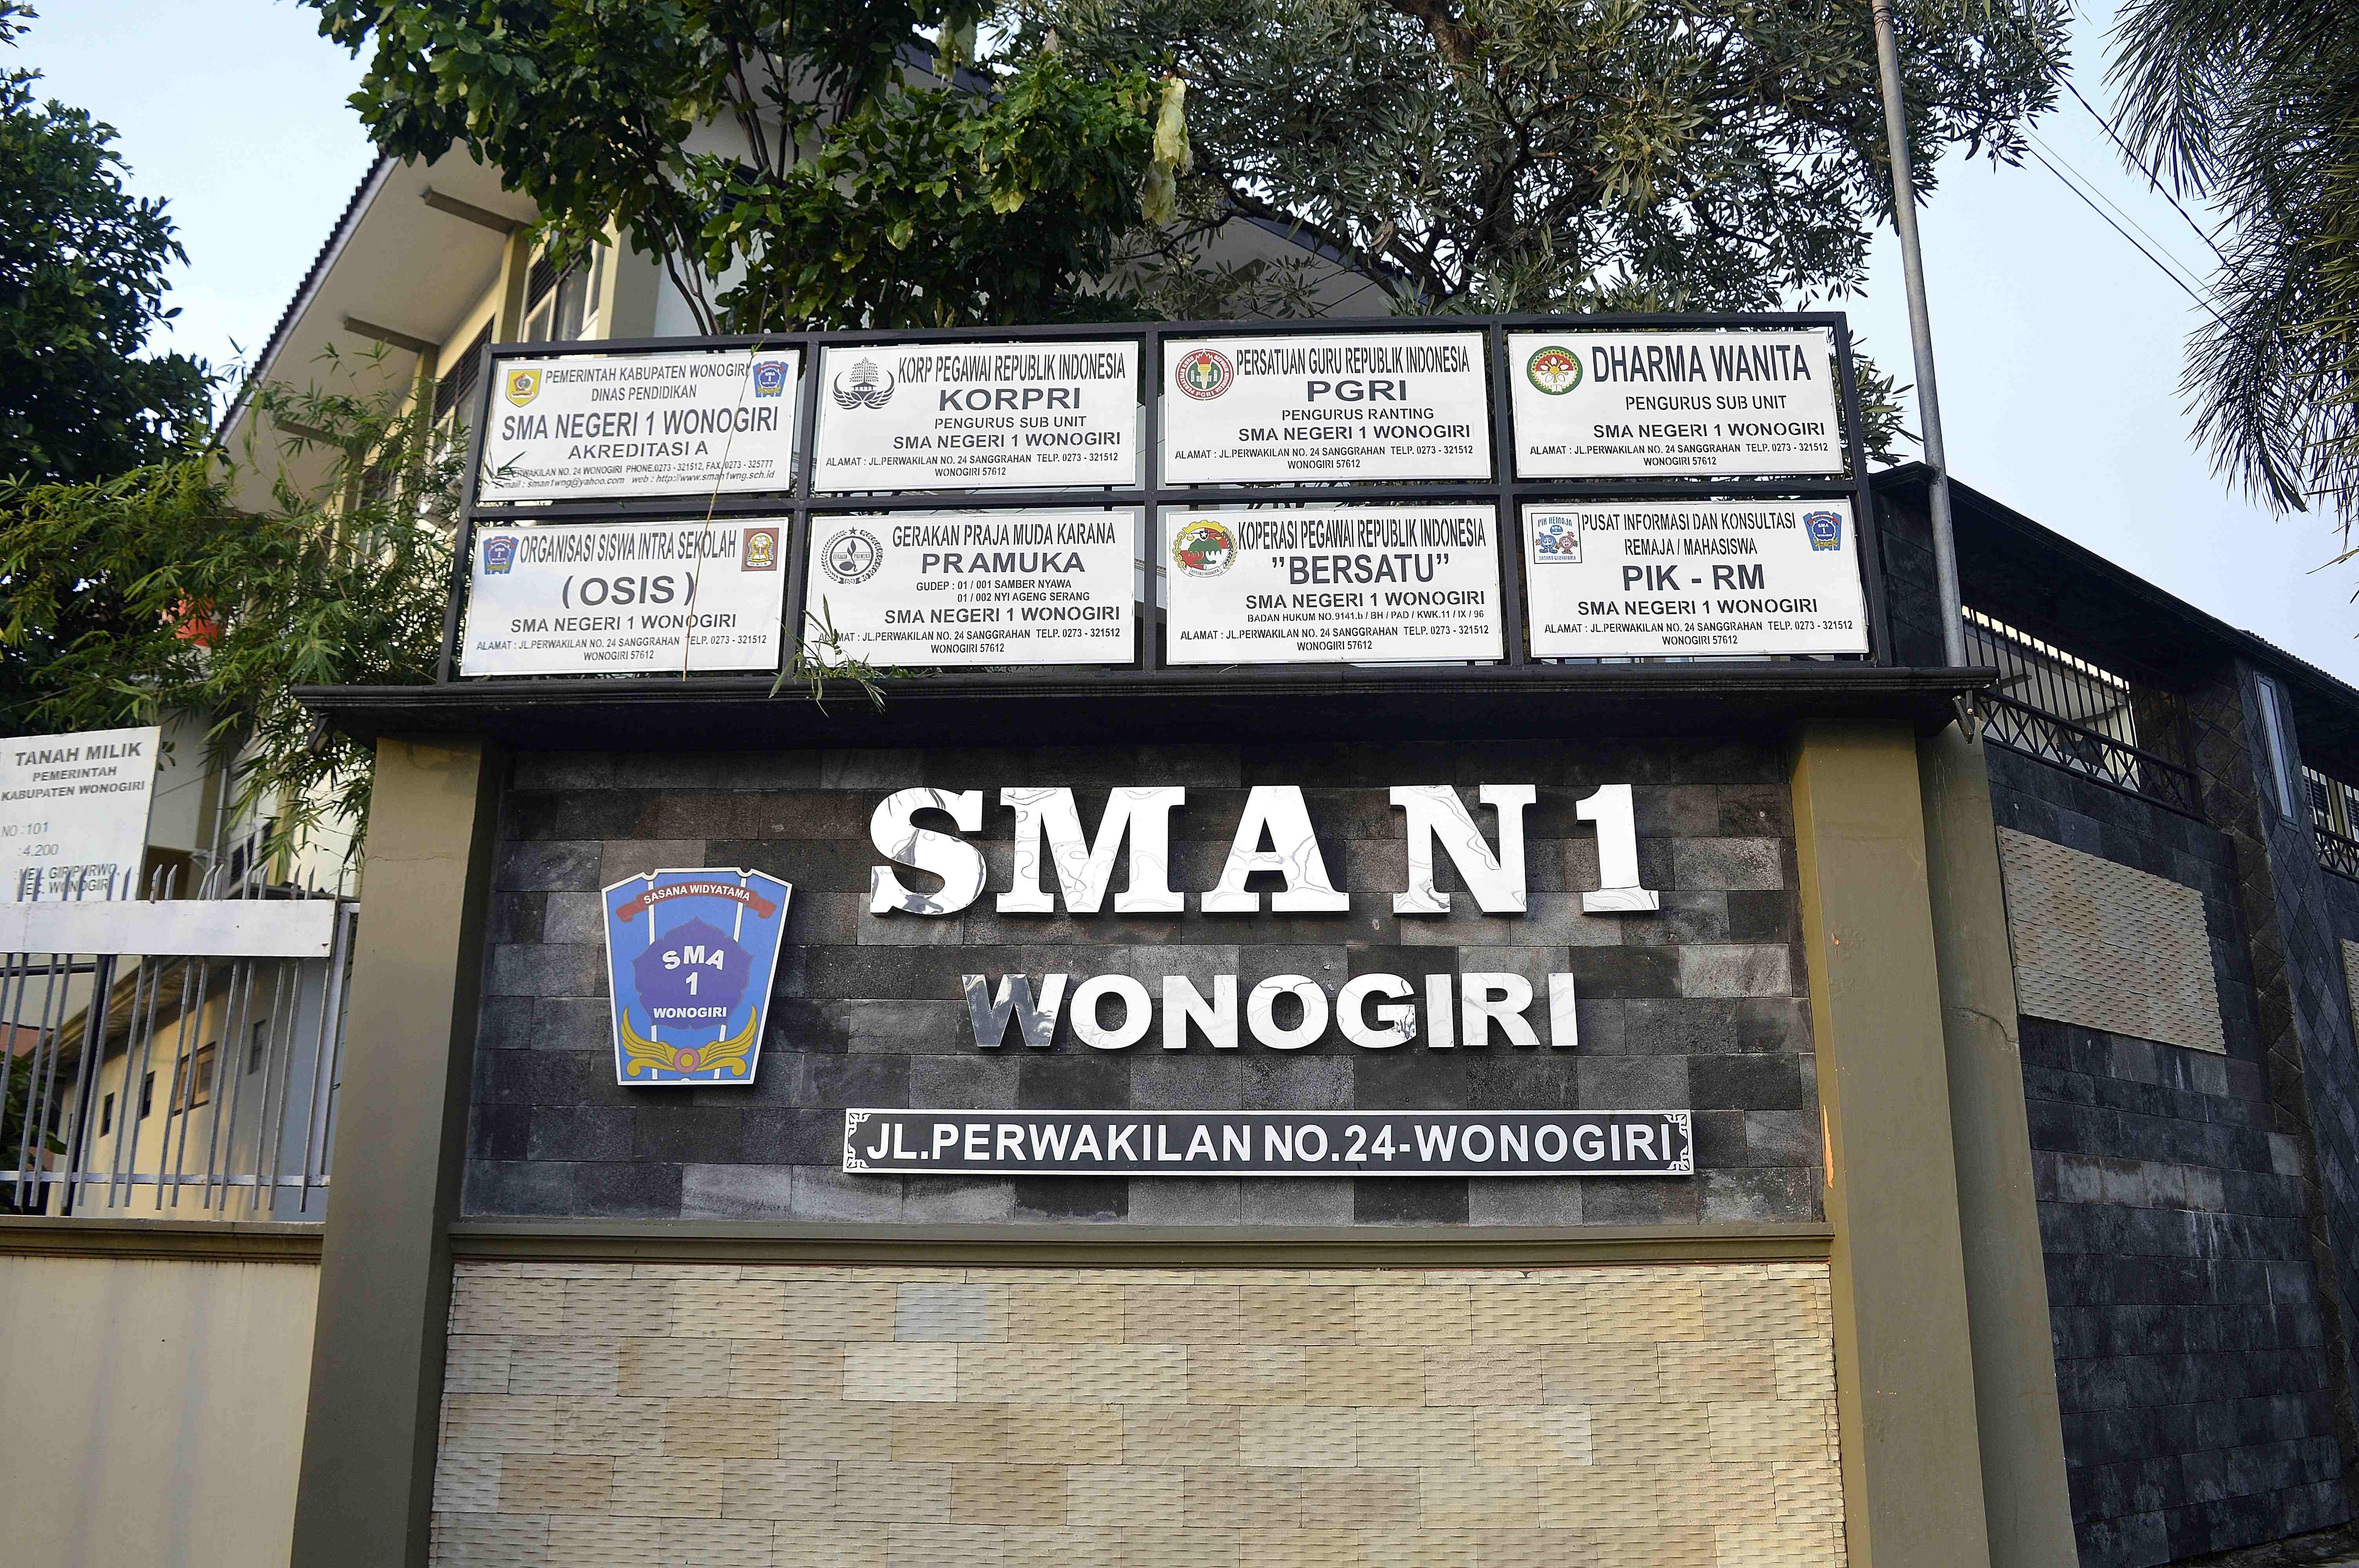 Sma Negeri 1 Wonogiri Wikiwand Museum Wayang Kulit Indonesia Kab